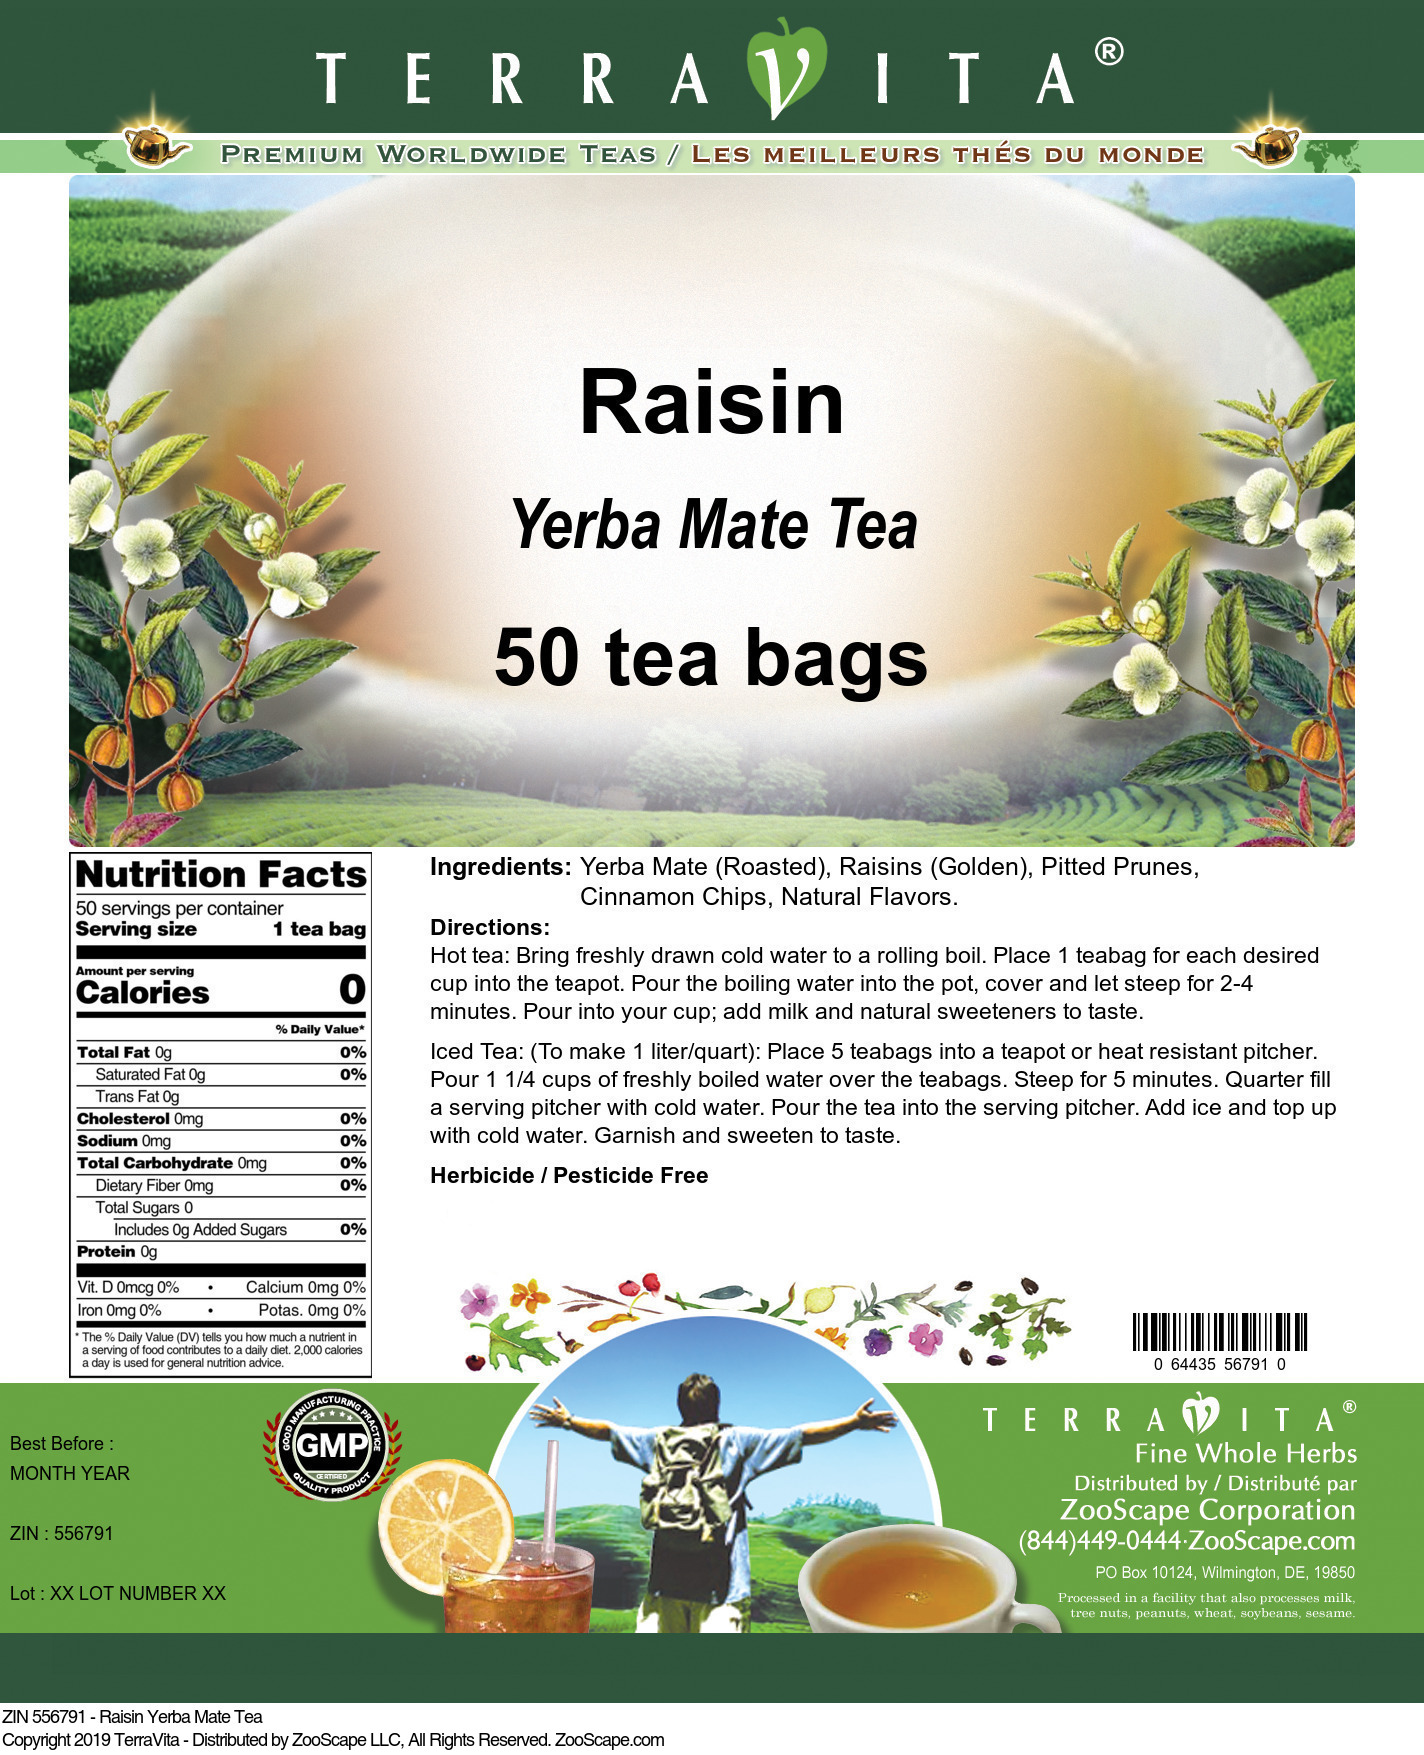 Raisin Yerba Mate Tea